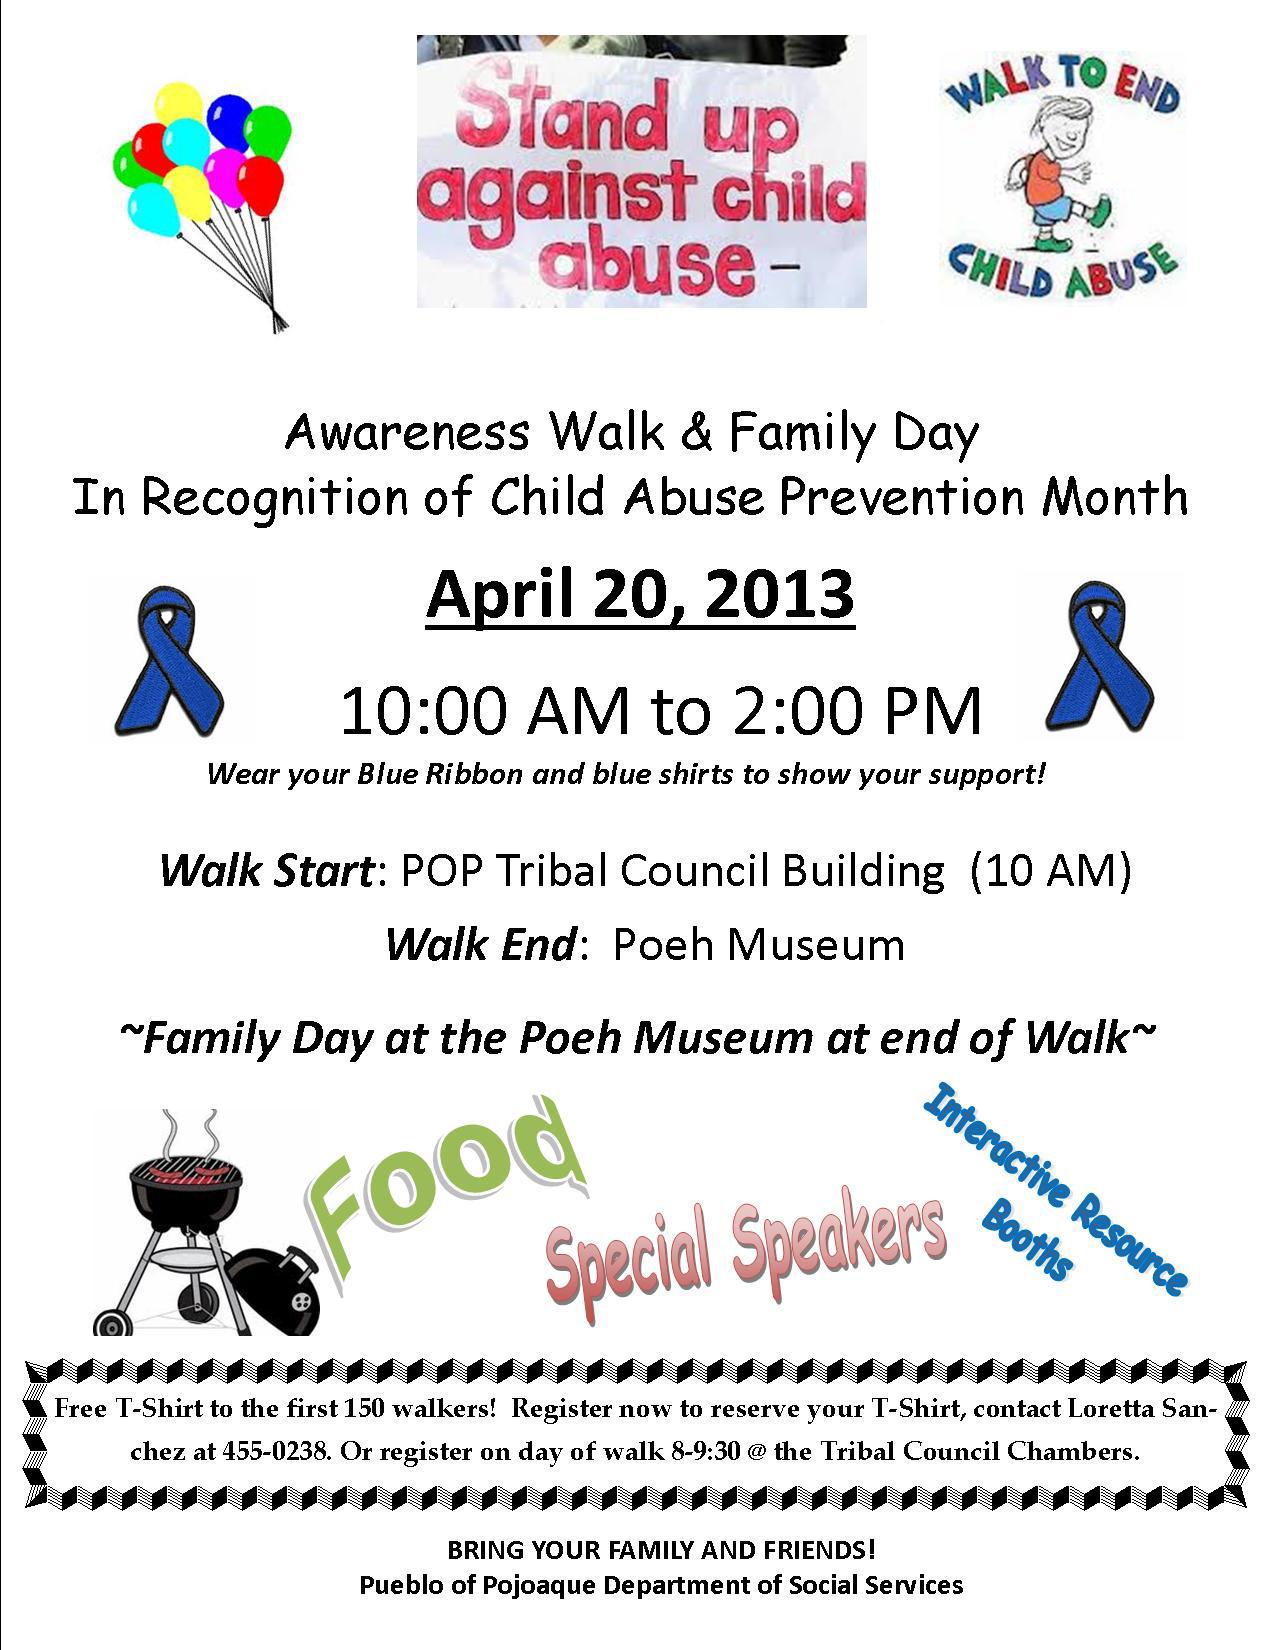 Awareness Walk Family Day 04 02 13-1